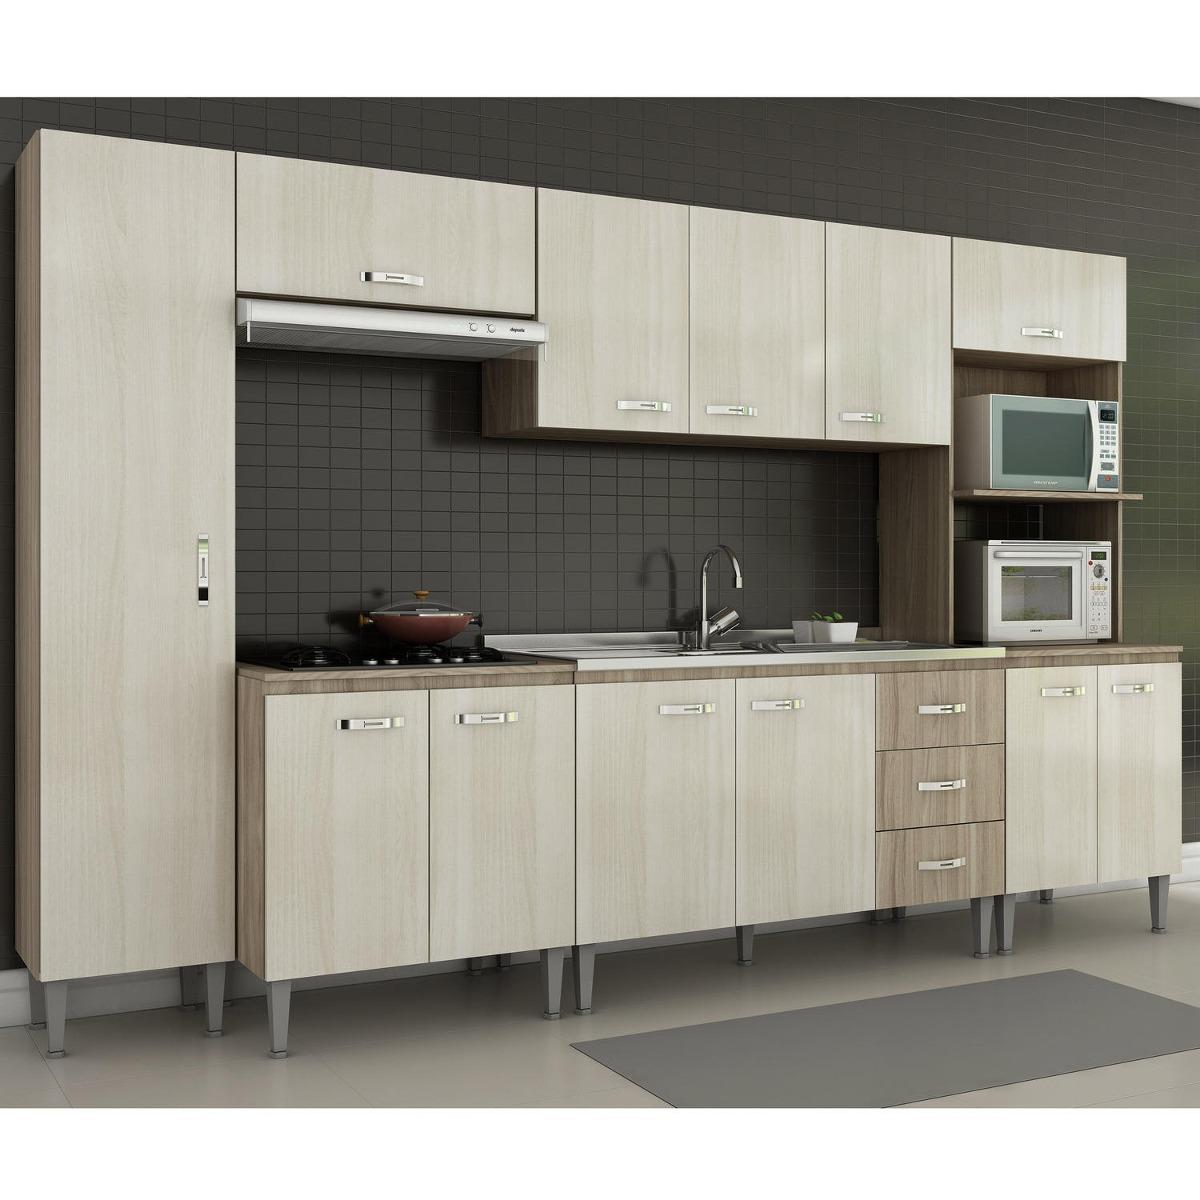 Cozinha Completa 6 Pe As Master Siena M Veis N O A Ig R 999 90